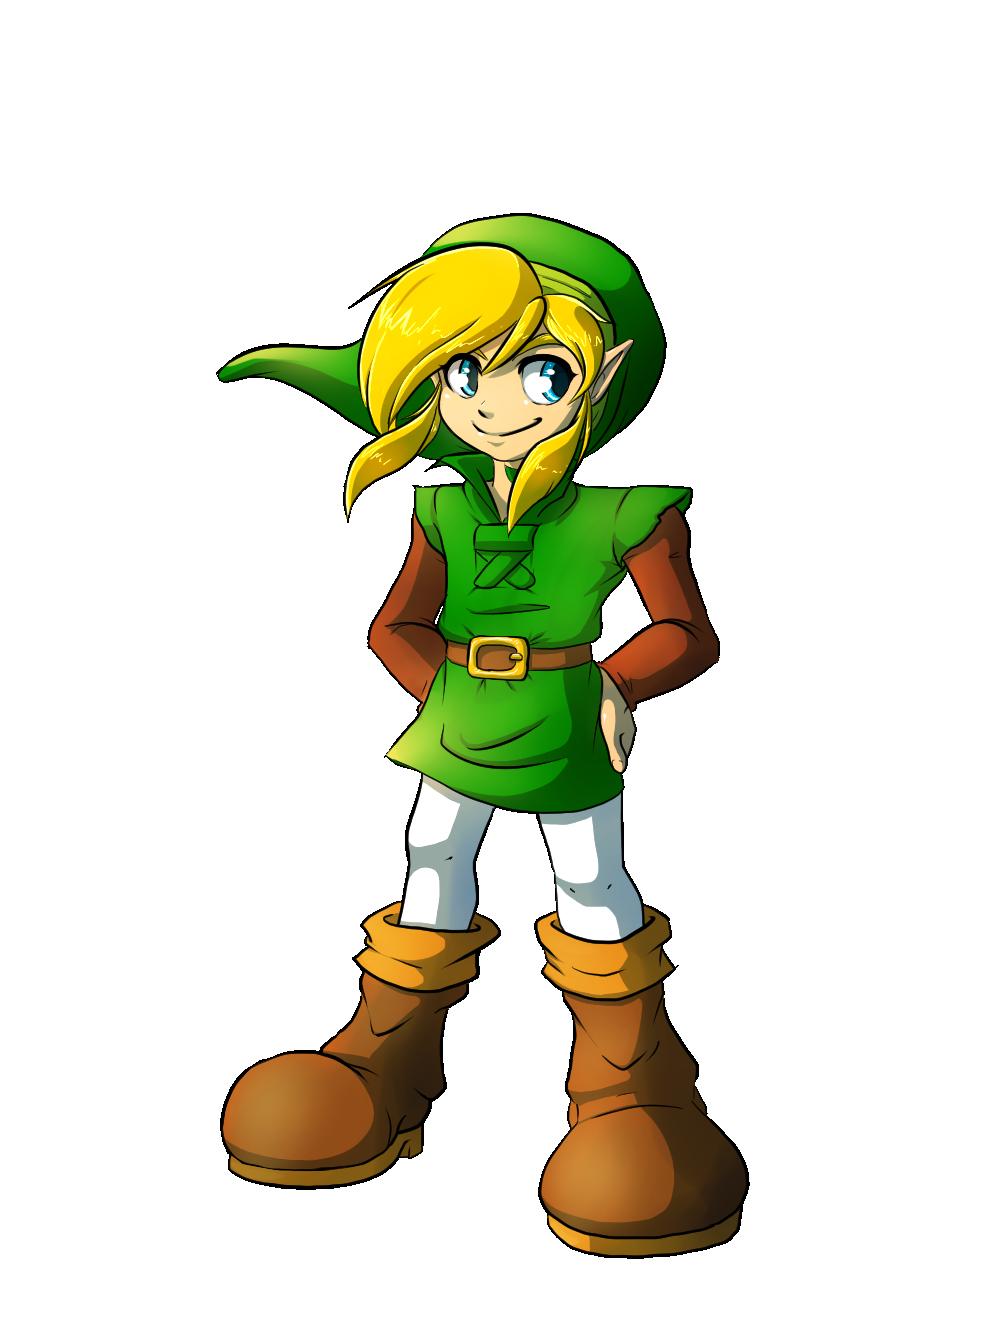 Hero Link by rinkunokoisuru